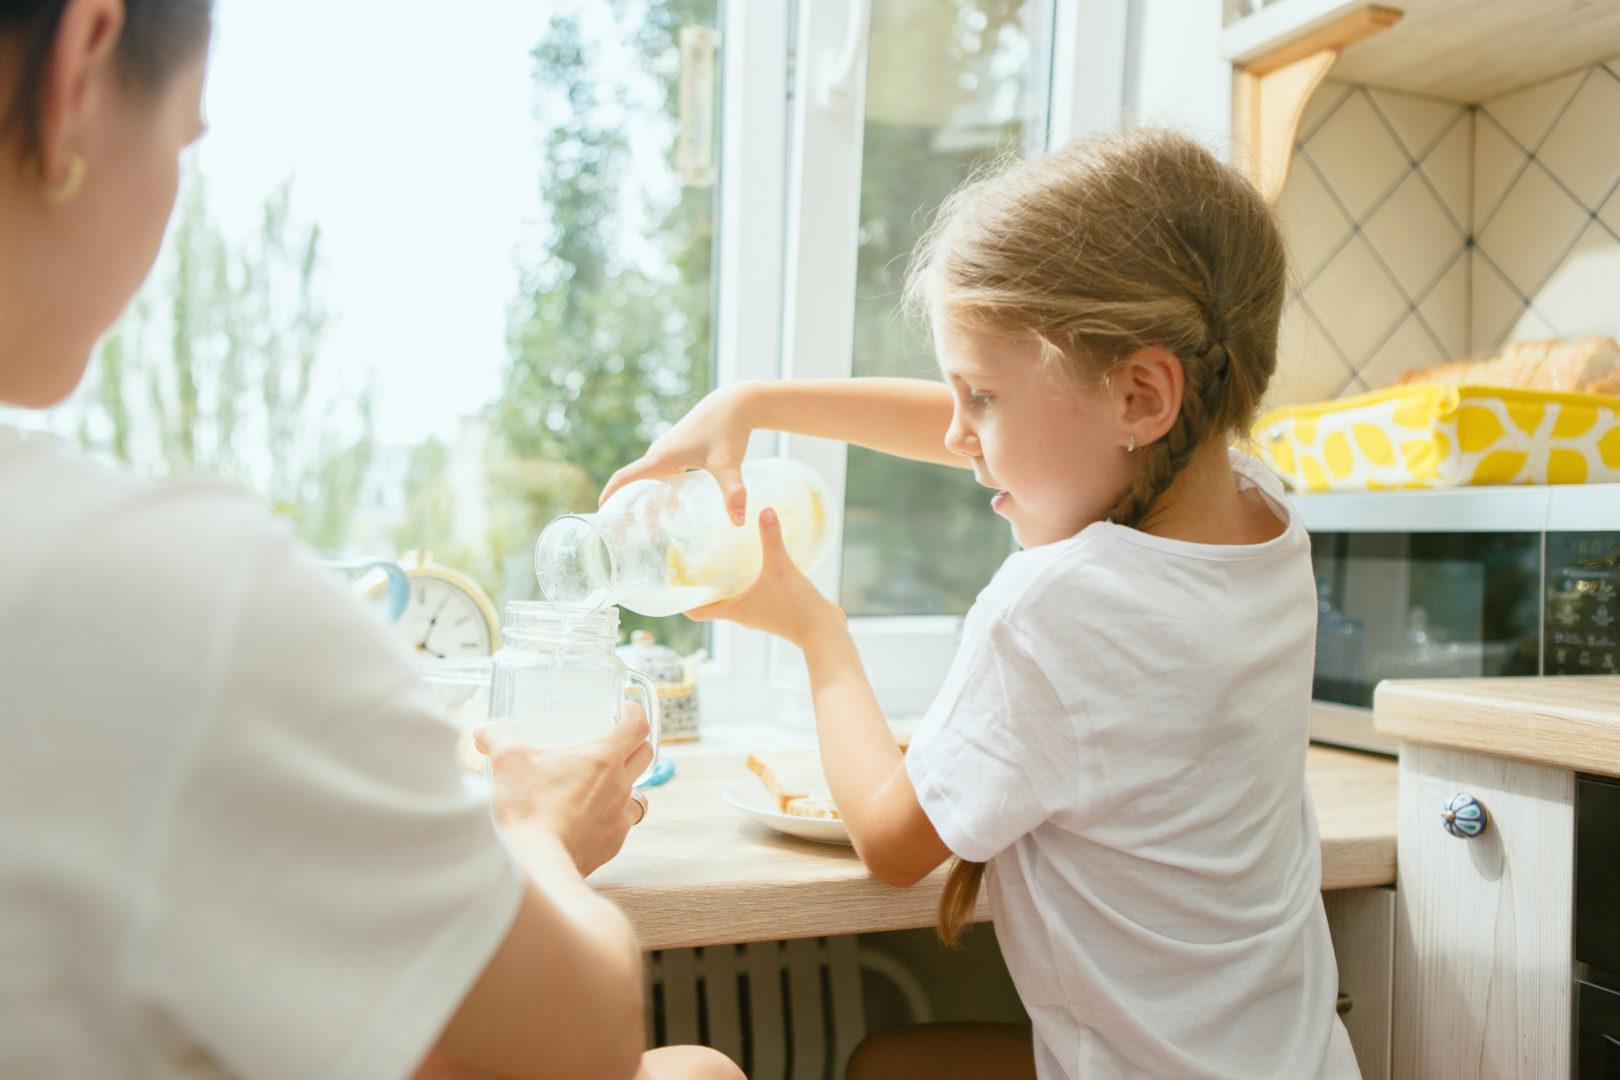 Kid standing in kitchen pouring milk into jar